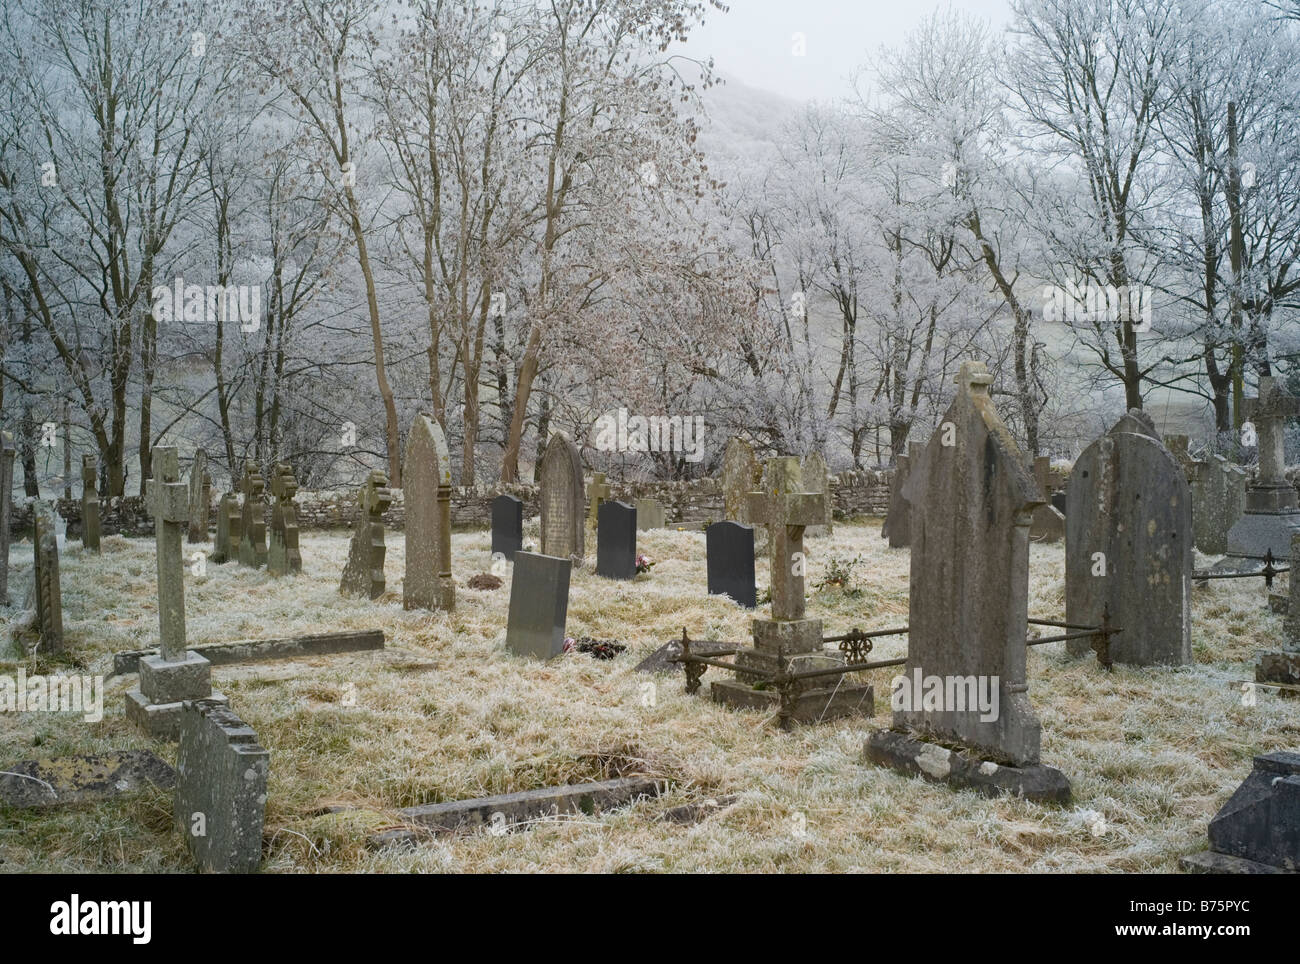 Country churchyard, England. - Stock Image